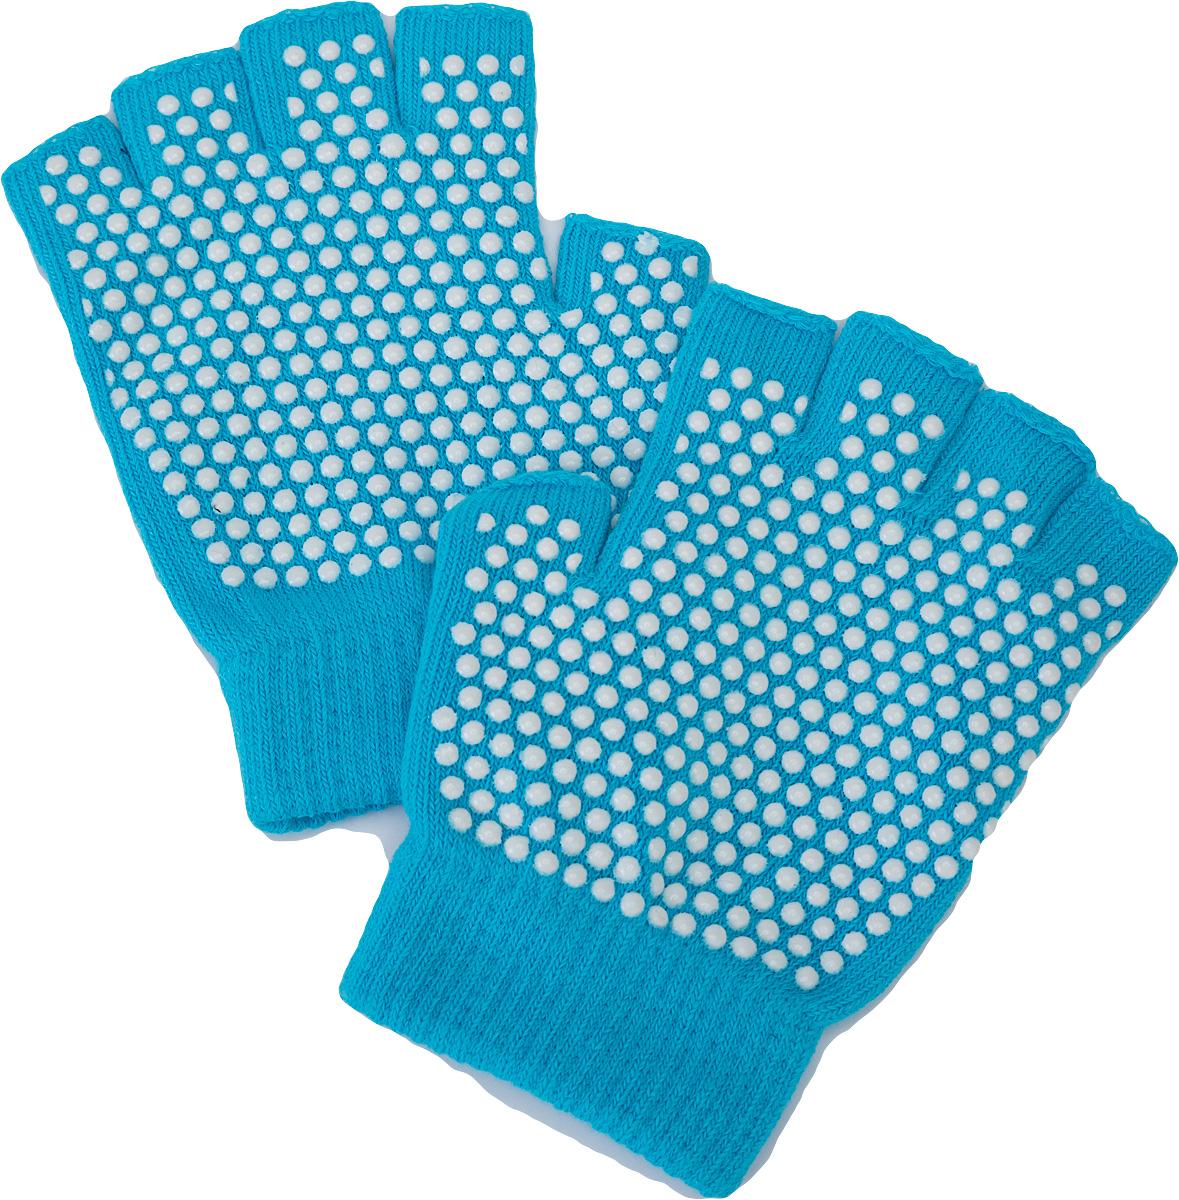 цена Перчатки для йоги Bradex, цвет: бирюзовый. SF 0277. Размеры 14 х 11 х 4 см онлайн в 2017 году